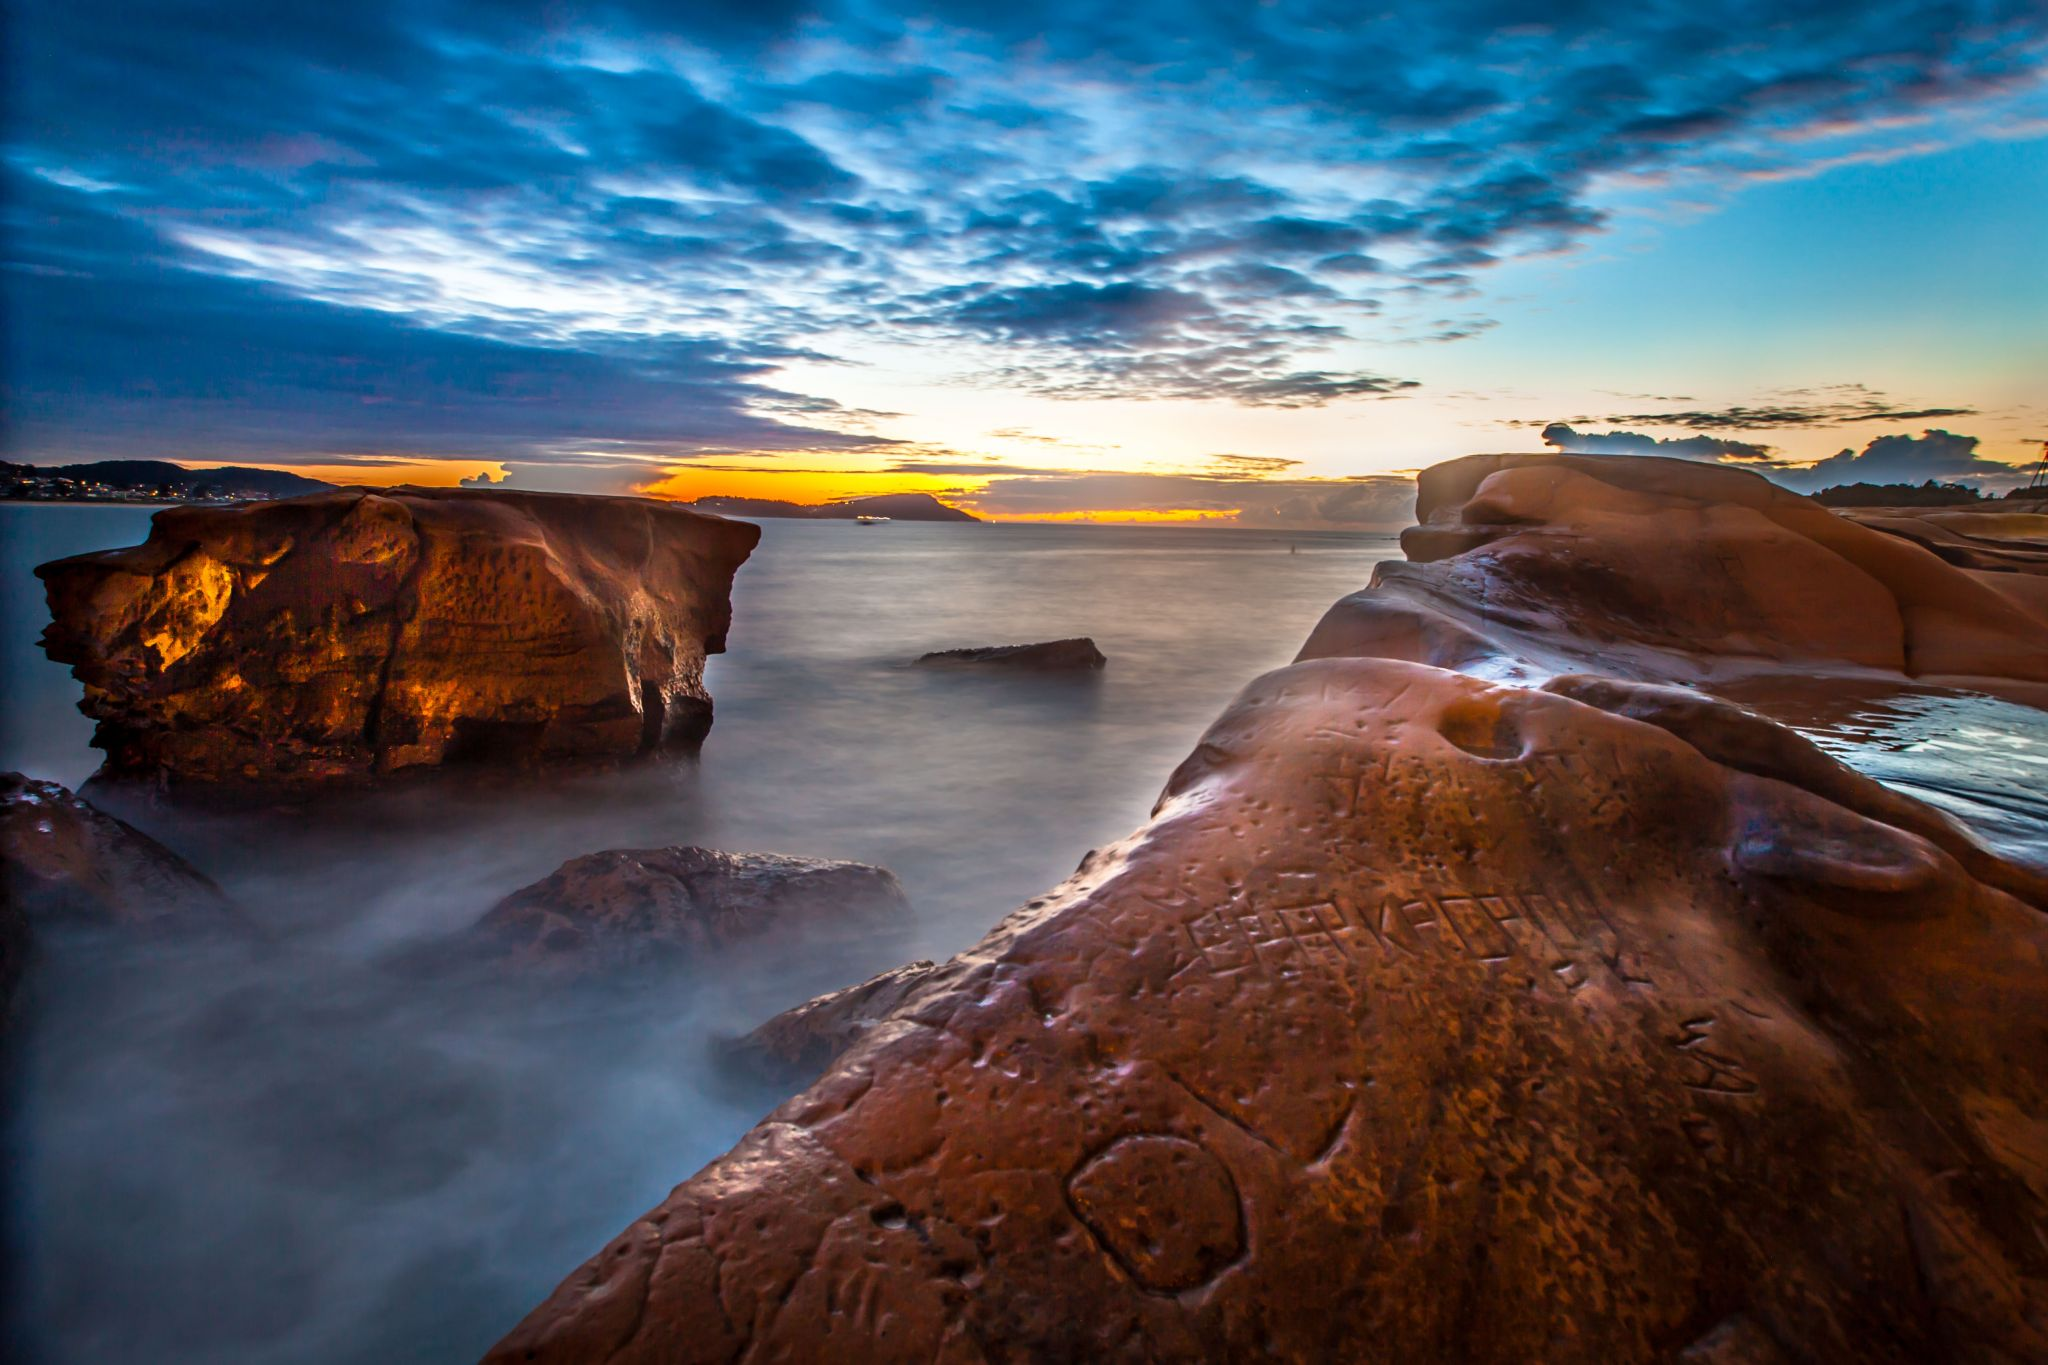 Rock sunrise Terrigal Beach, Central Coast New South Wales, Australia